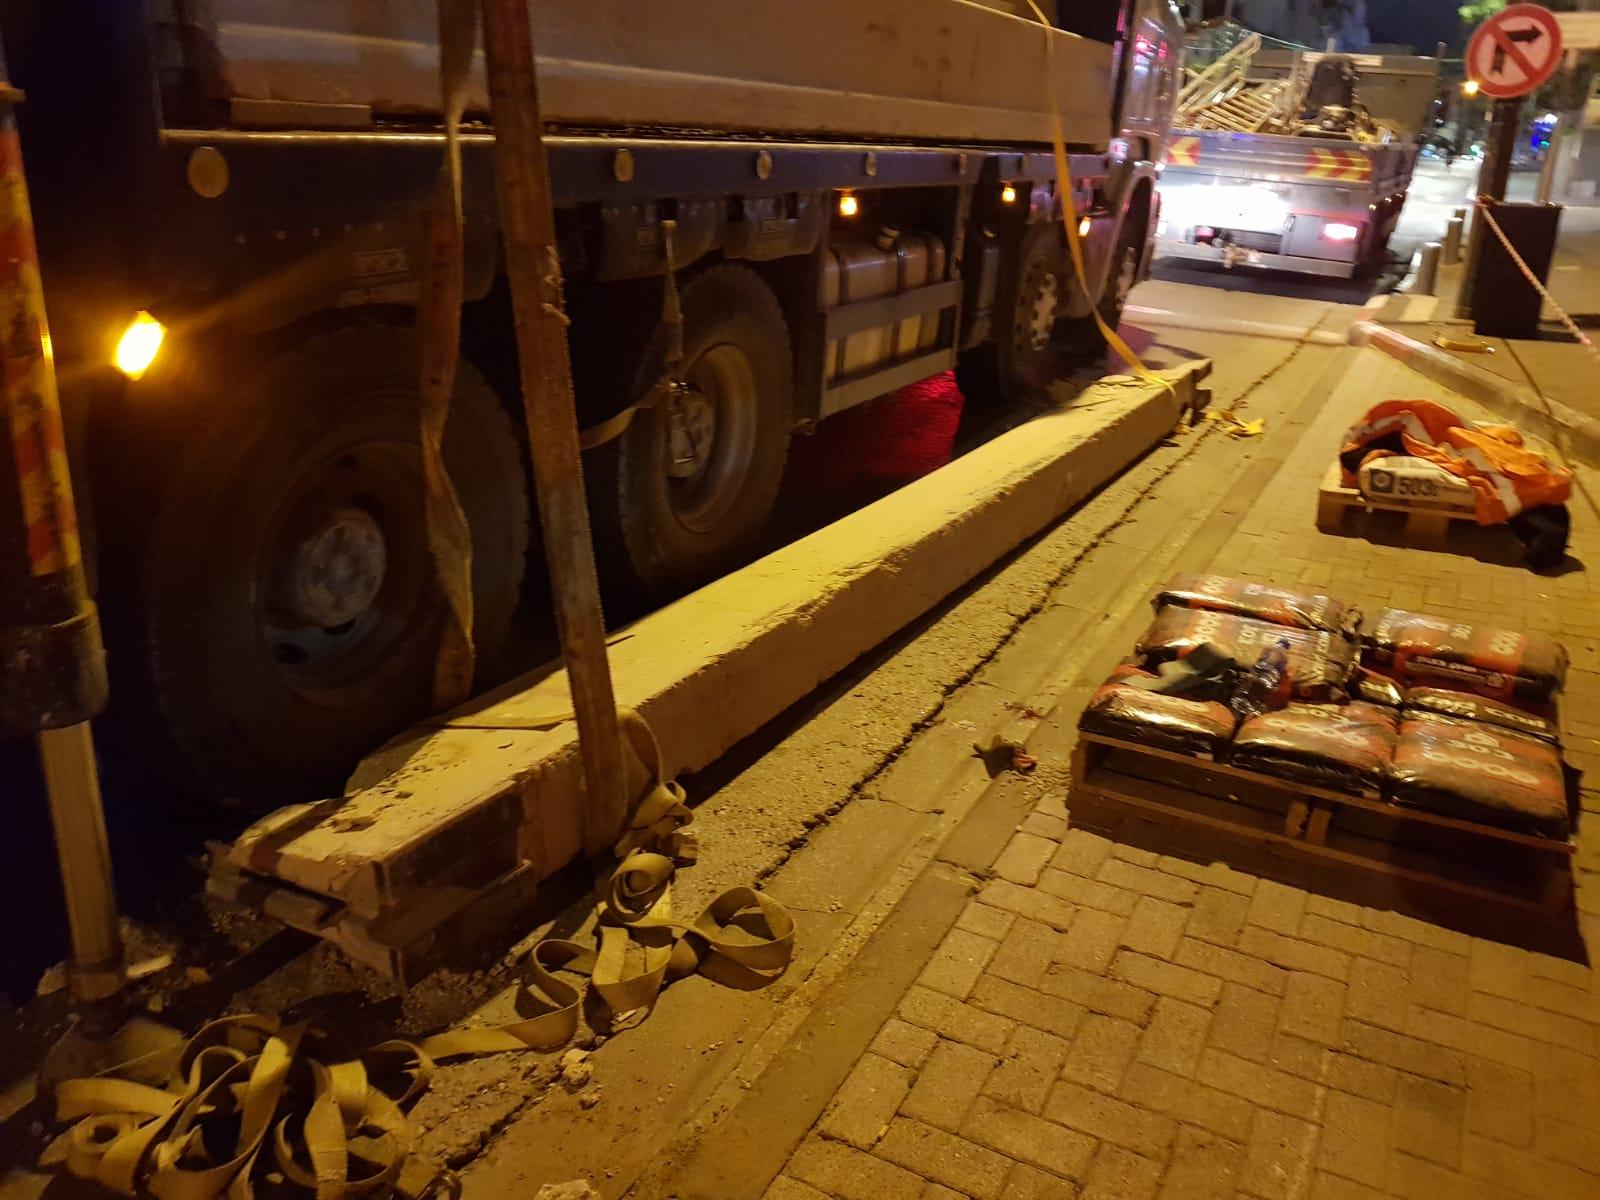 Photo of פועל בניין נפגע הלילה מקורות בטון שנפלו עליו ברחוב בן יהודה בתל אביב. מצבו קשה